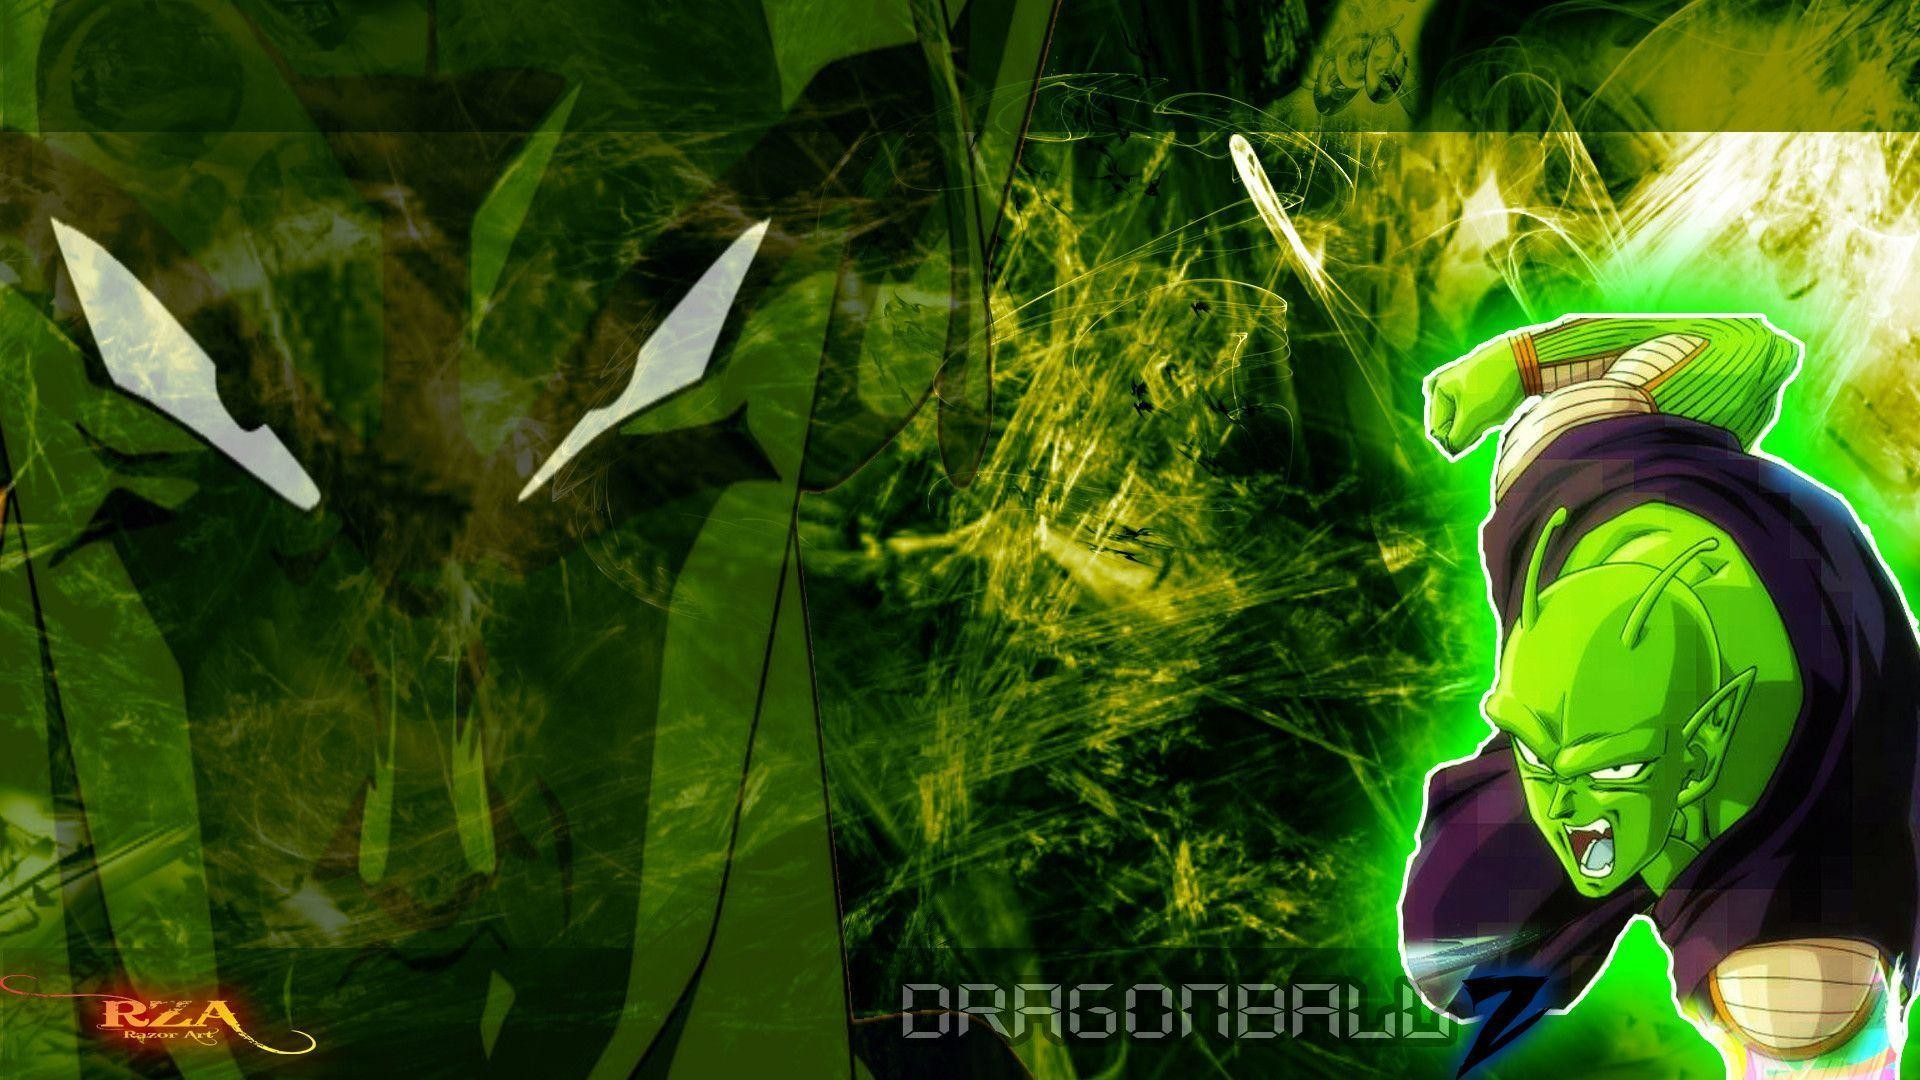 Dragonballz Piccolo Possesed Frieza Goku Vs Mobile Wallpaper .